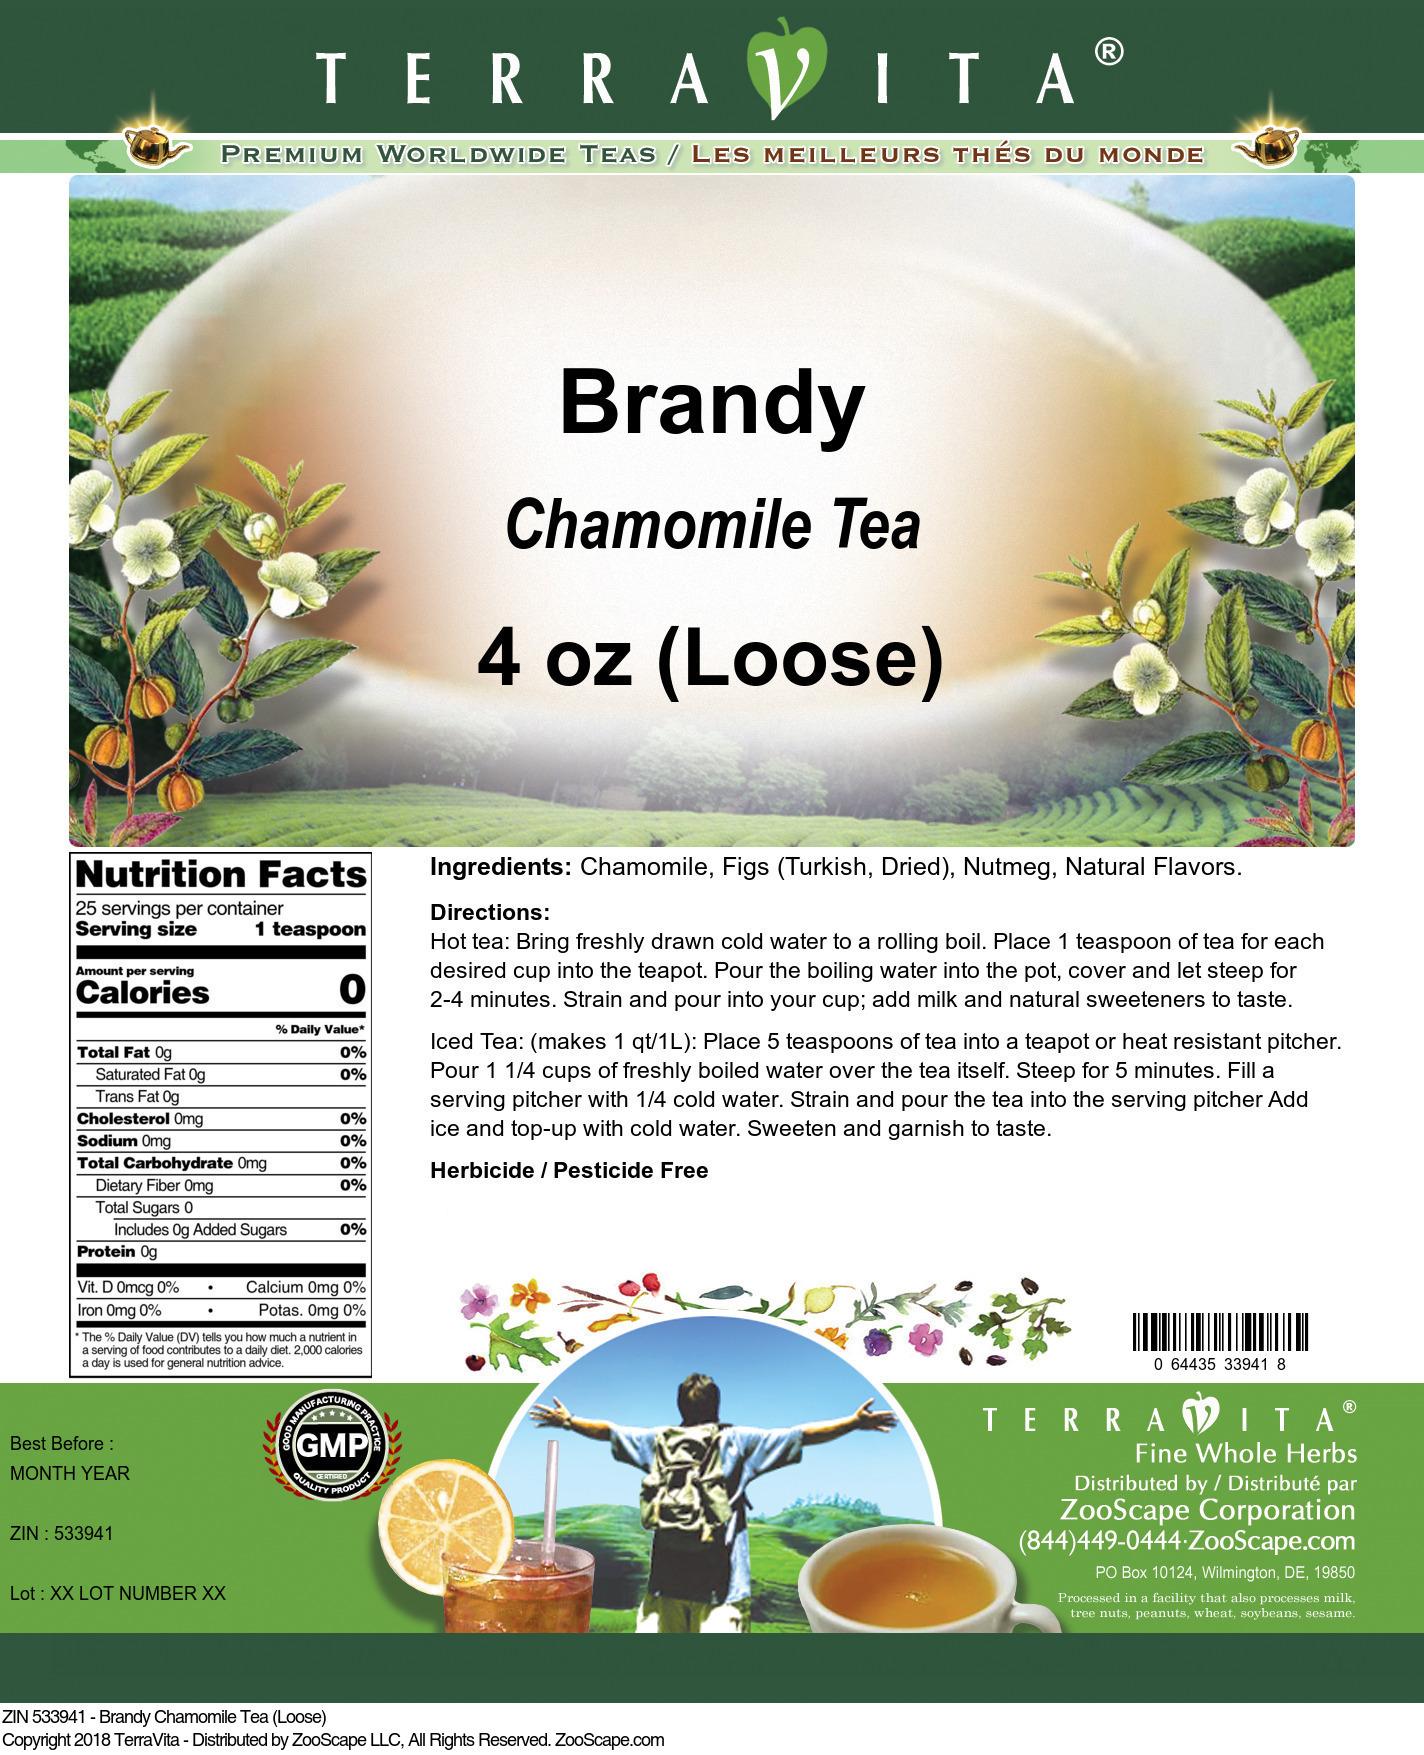 Brandy Chamomile Tea (Loose)